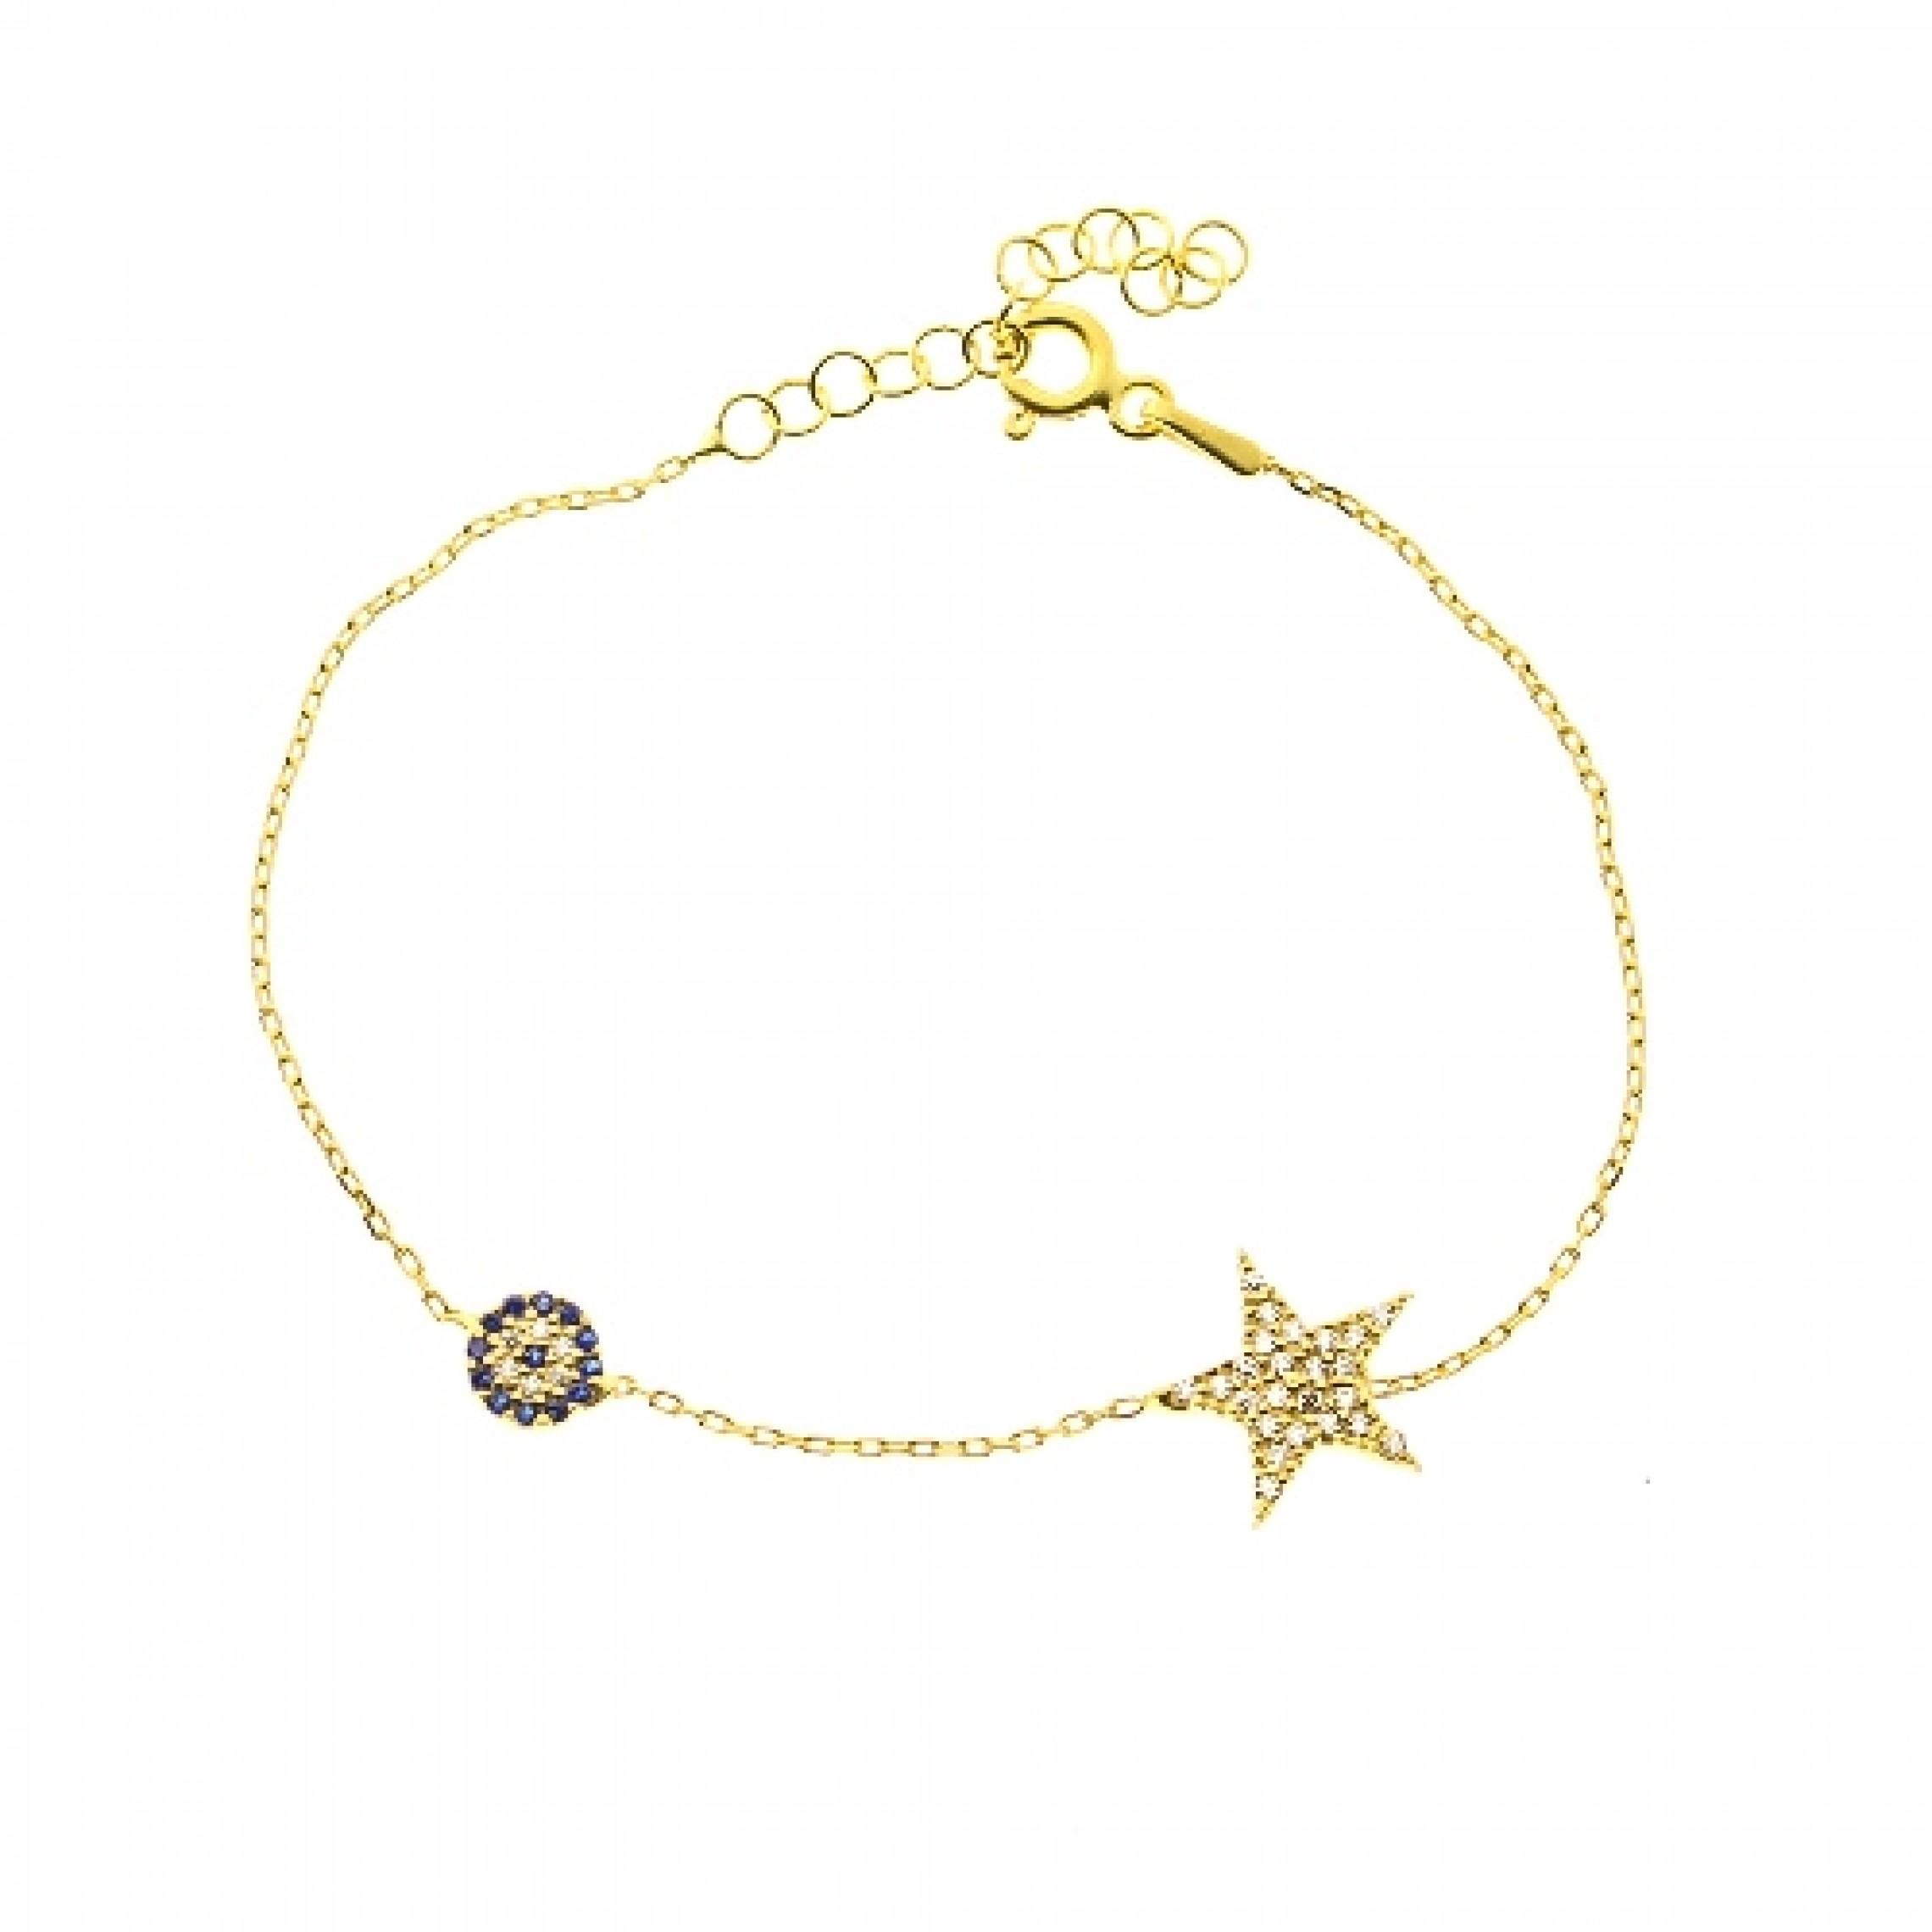 JB-180030 Evil Eye 925 Sterling Silver CZ Bracelet Star